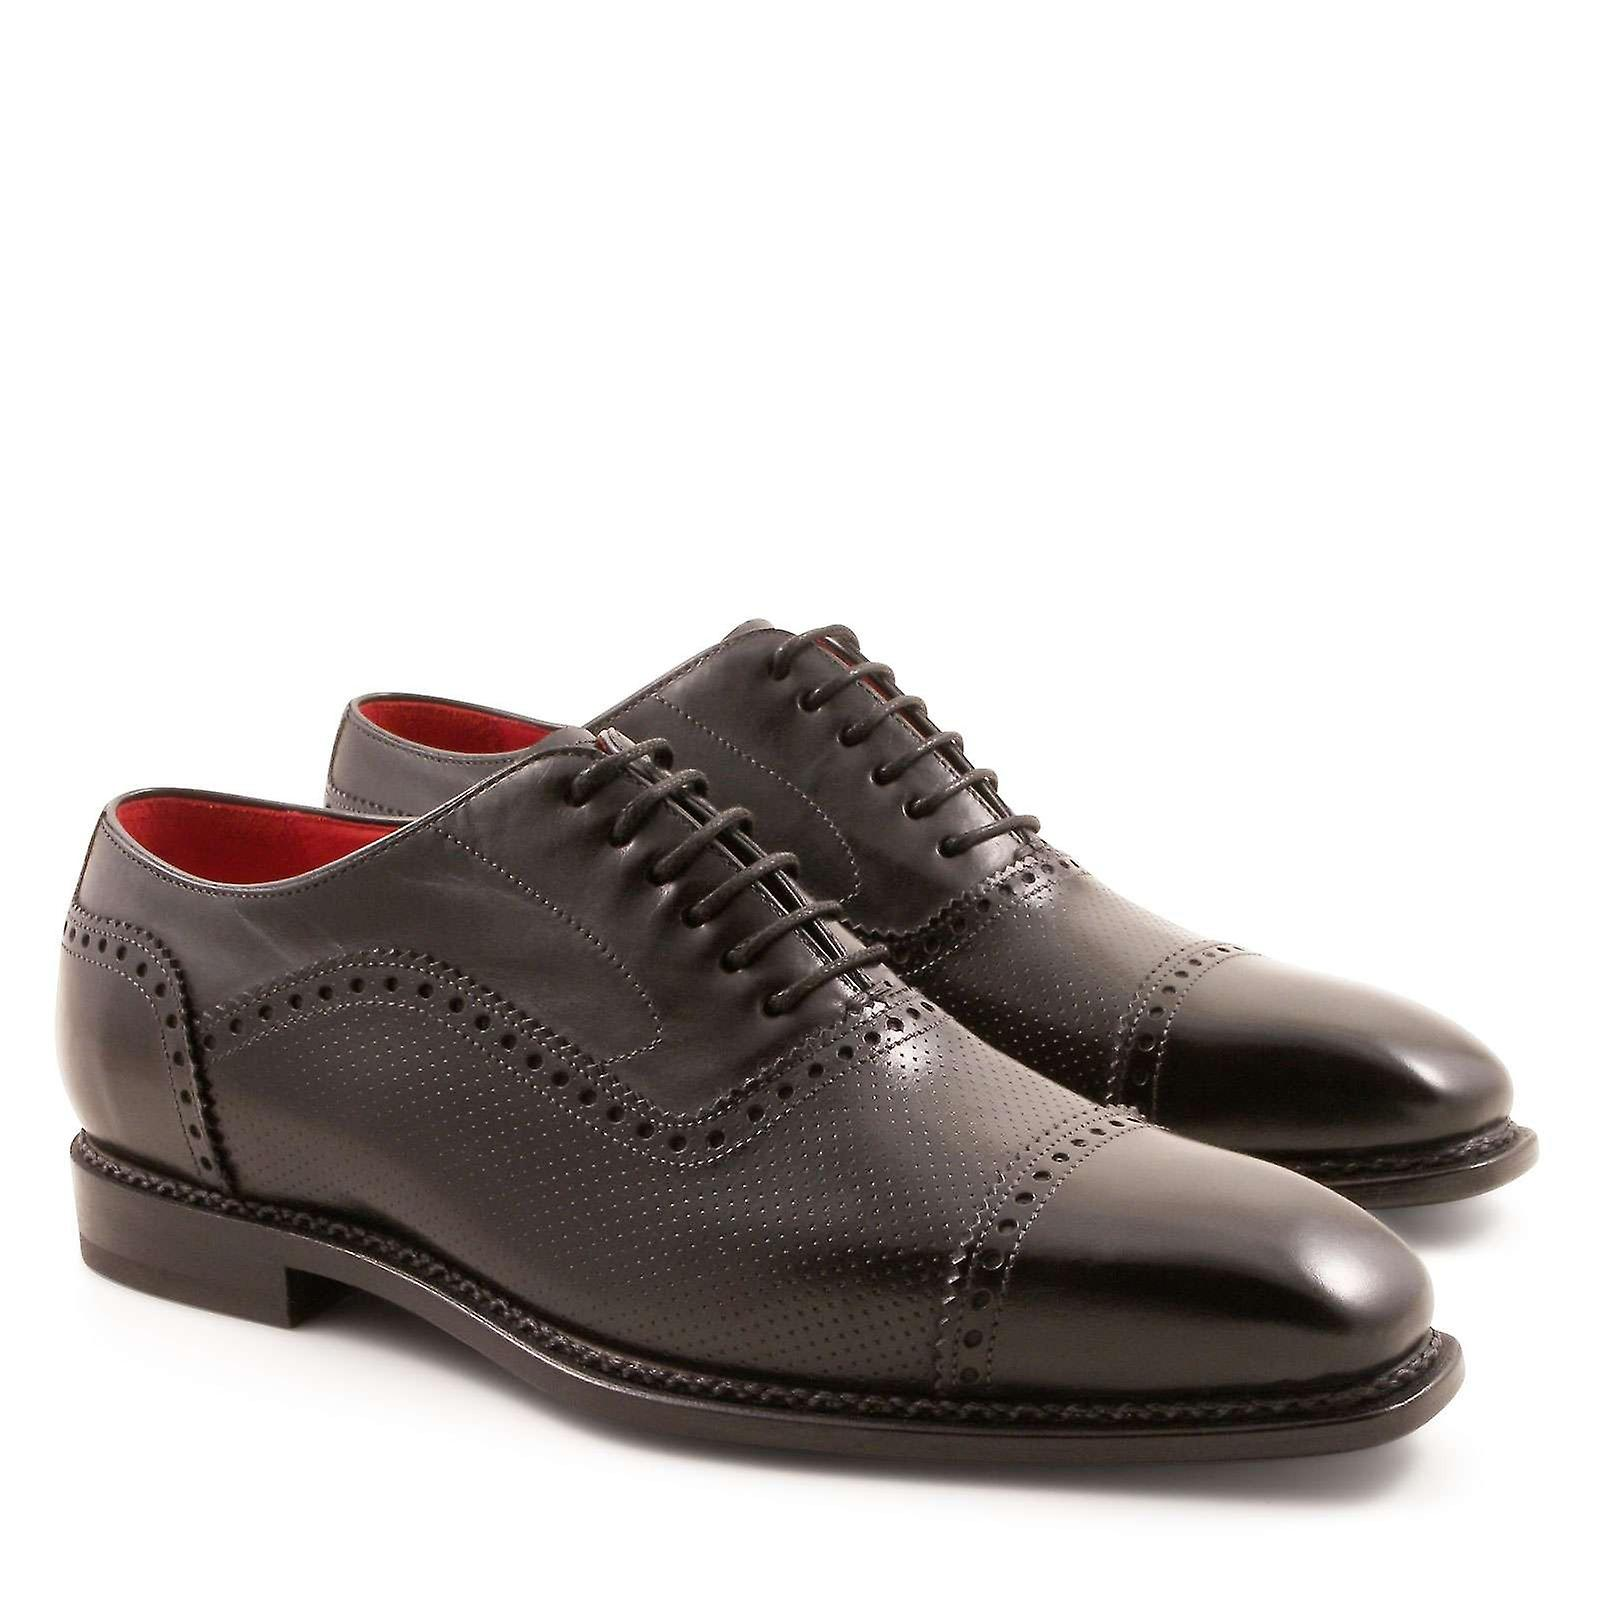 Handmade men& 039;s noir plain cap toe oxfords chaussures